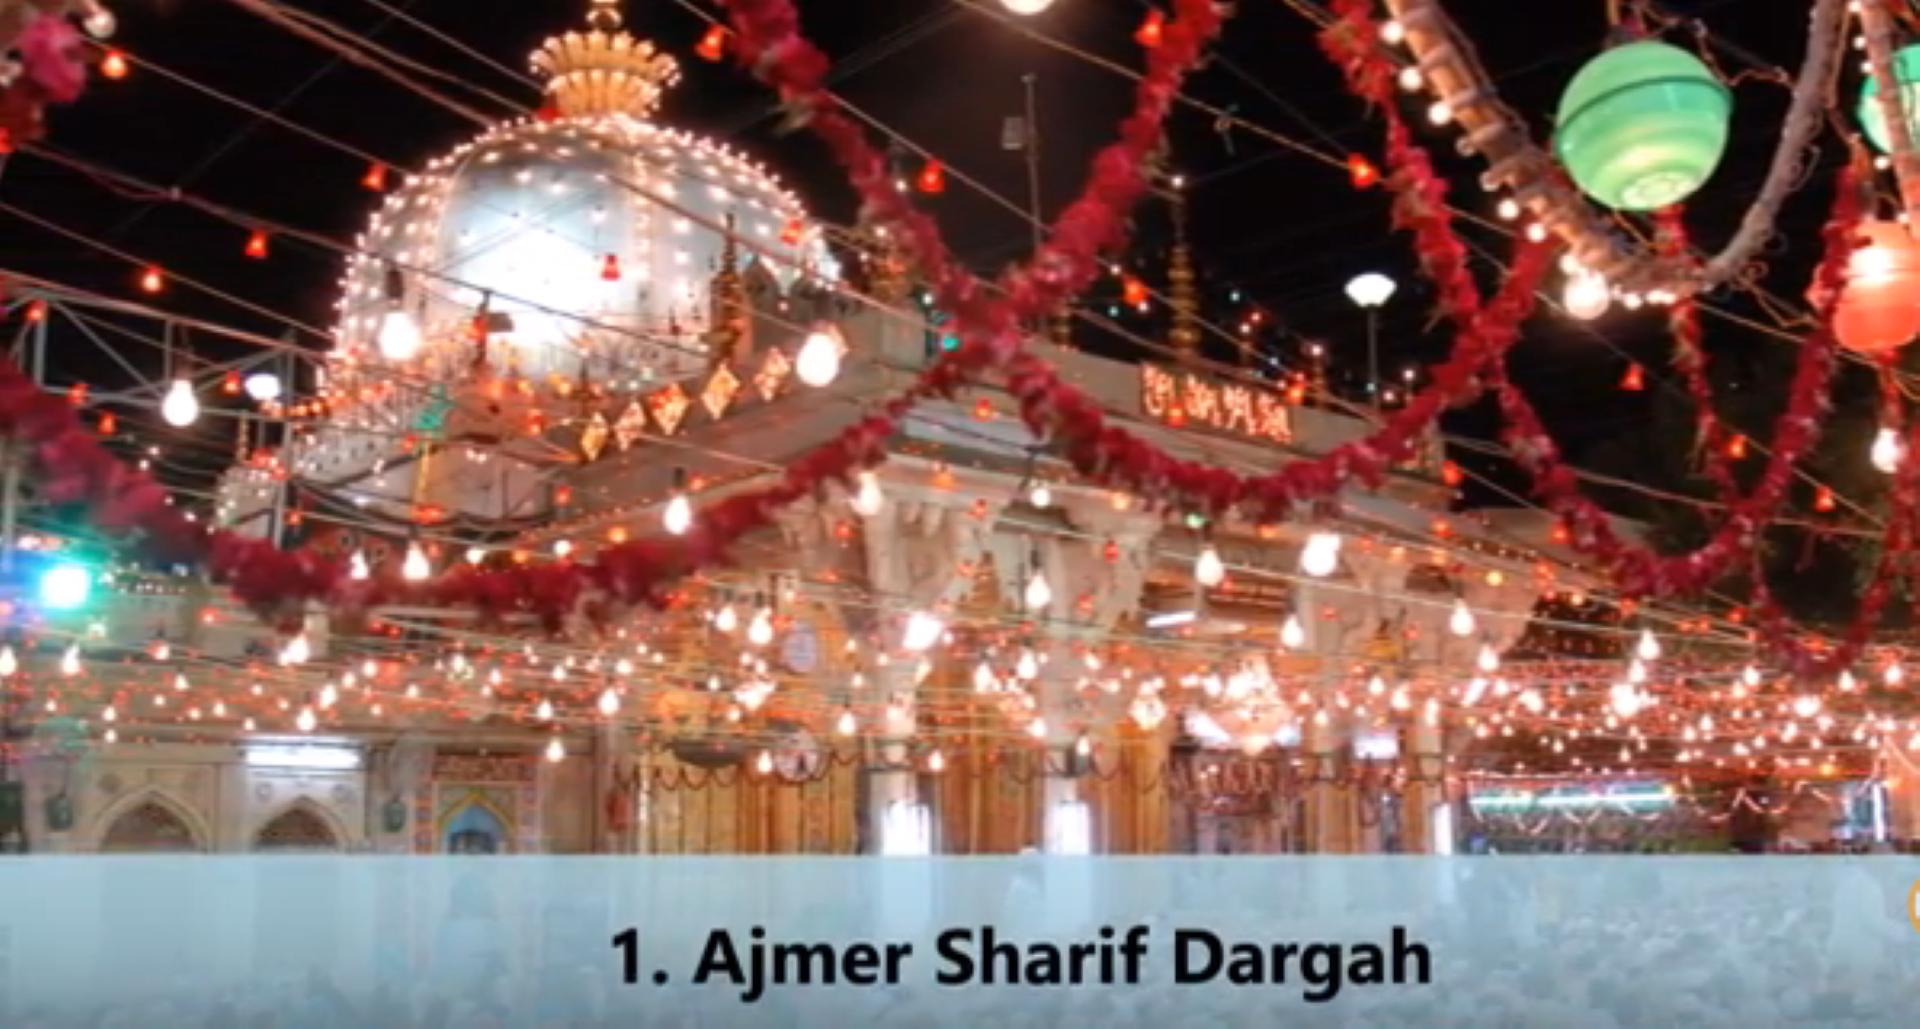 Ajmer Sharif Dargah tour by tempo traveller